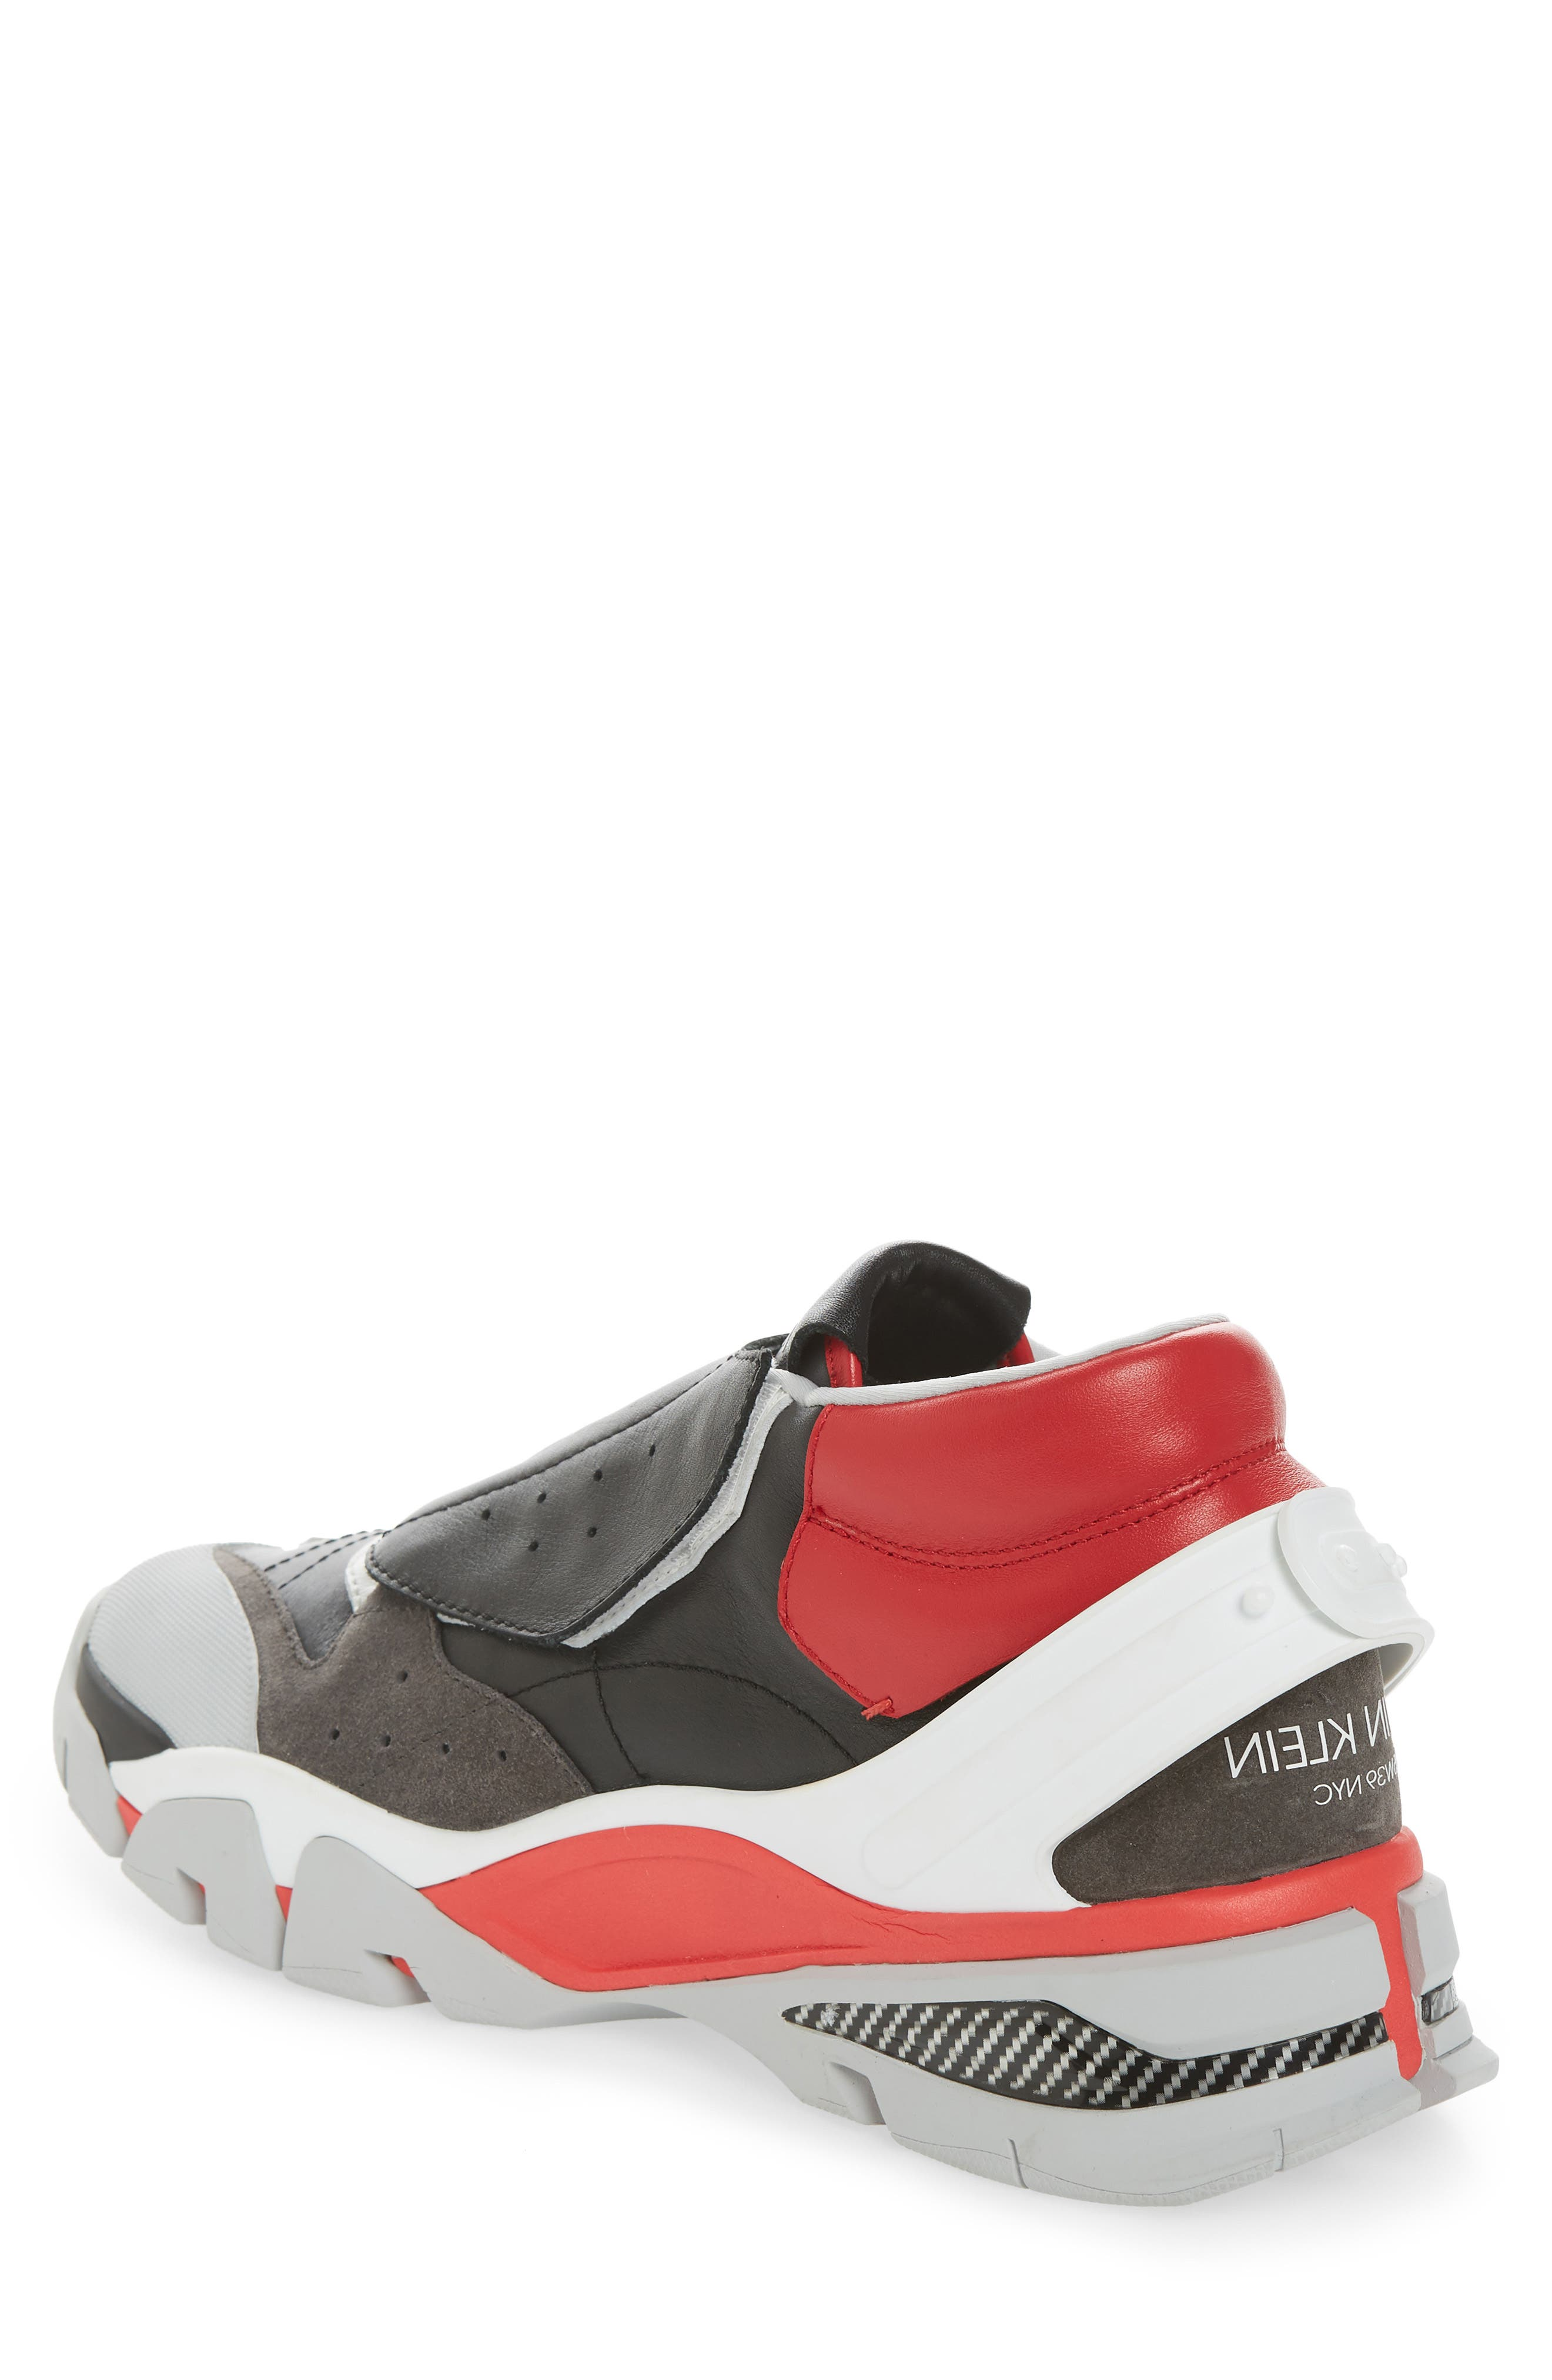 Cander 7 Sneaker,                             Alternate thumbnail 2, color,                             BLACK/ WHITE/ RED/ GREY